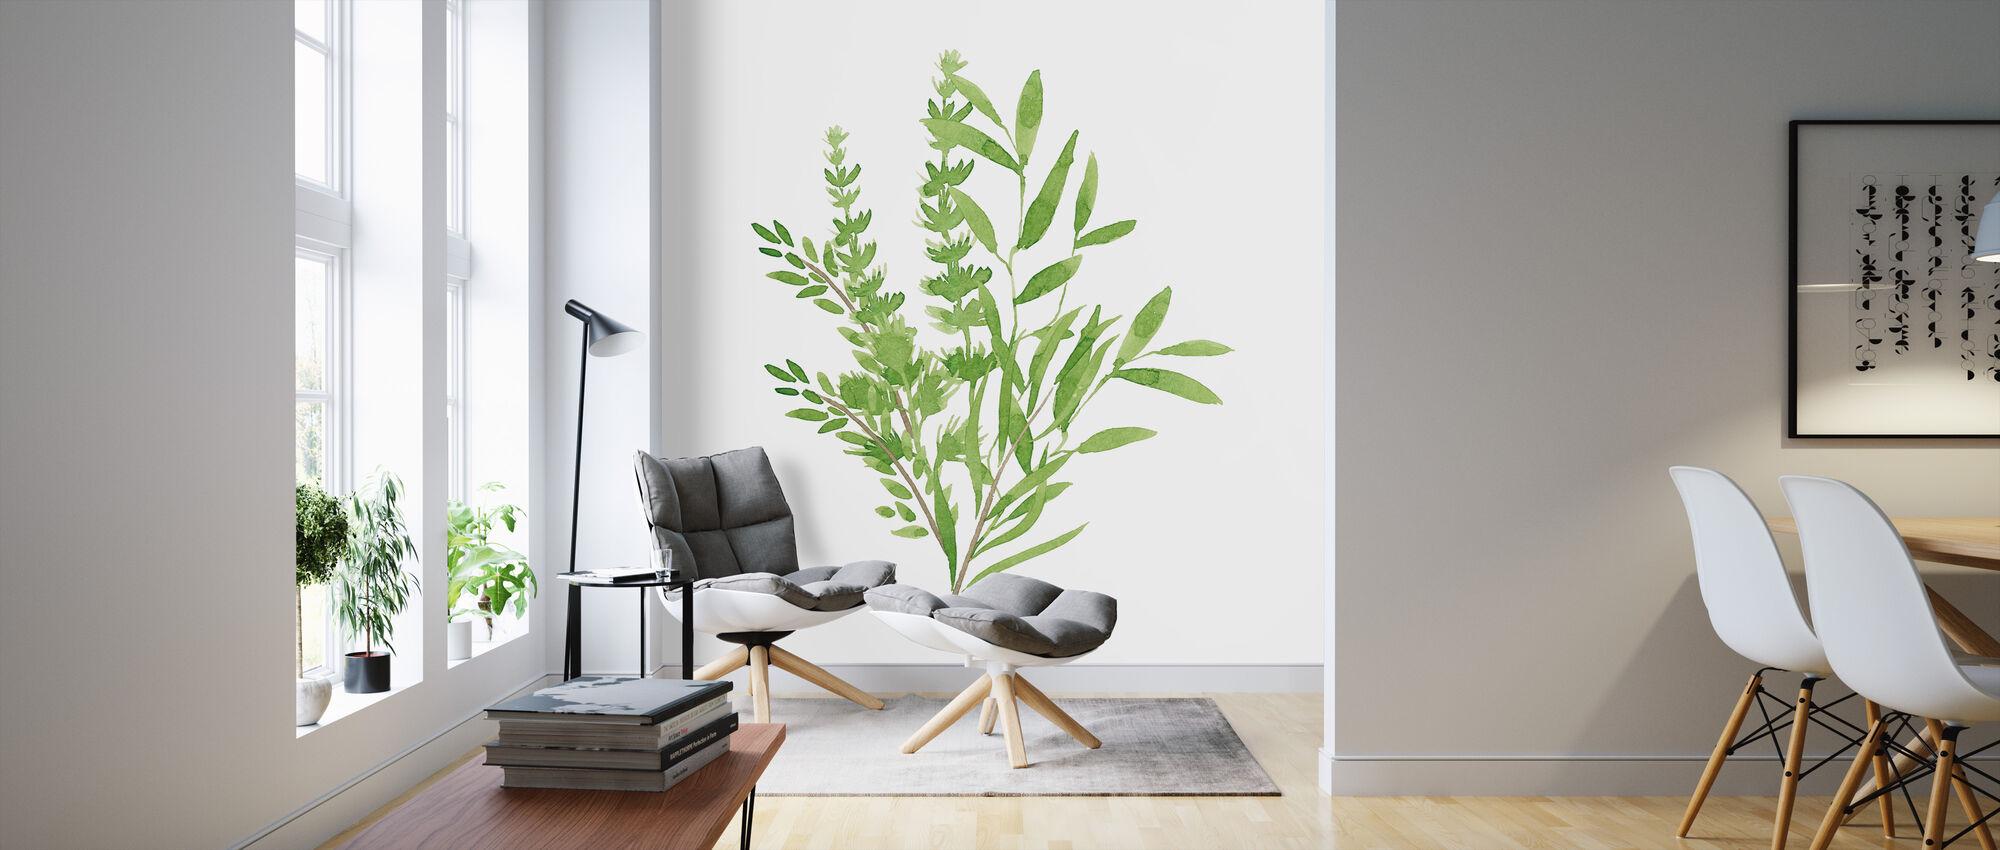 Plant Lush II - Wallpaper - Living Room